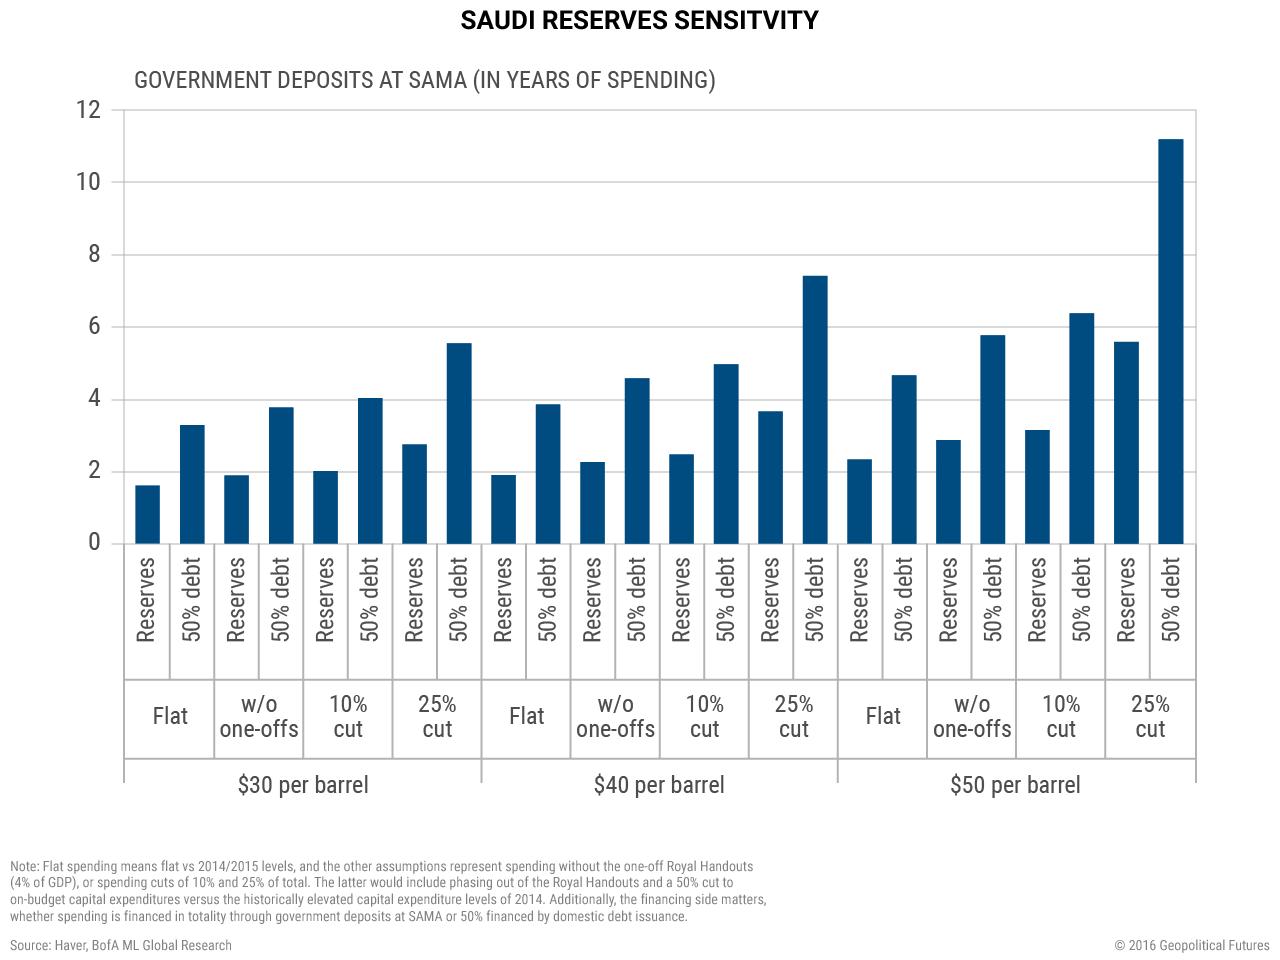 saudi-reserves-sensitvity